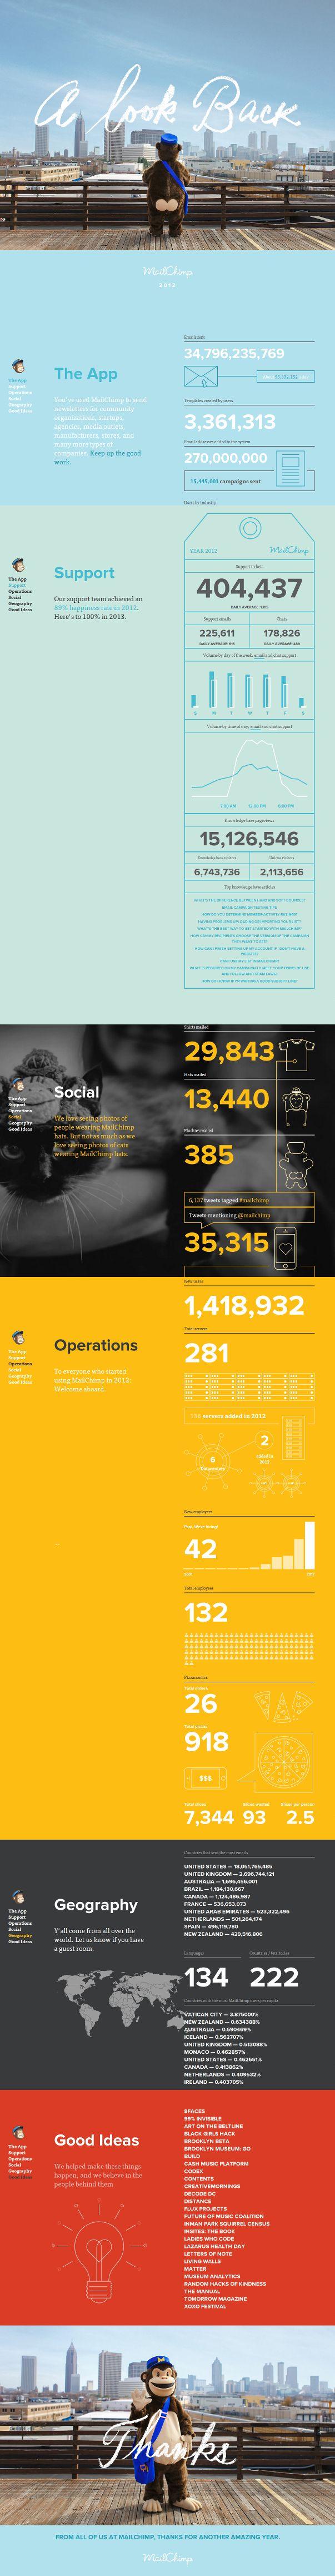 A Look Back - MailChimp #web #design #infographic